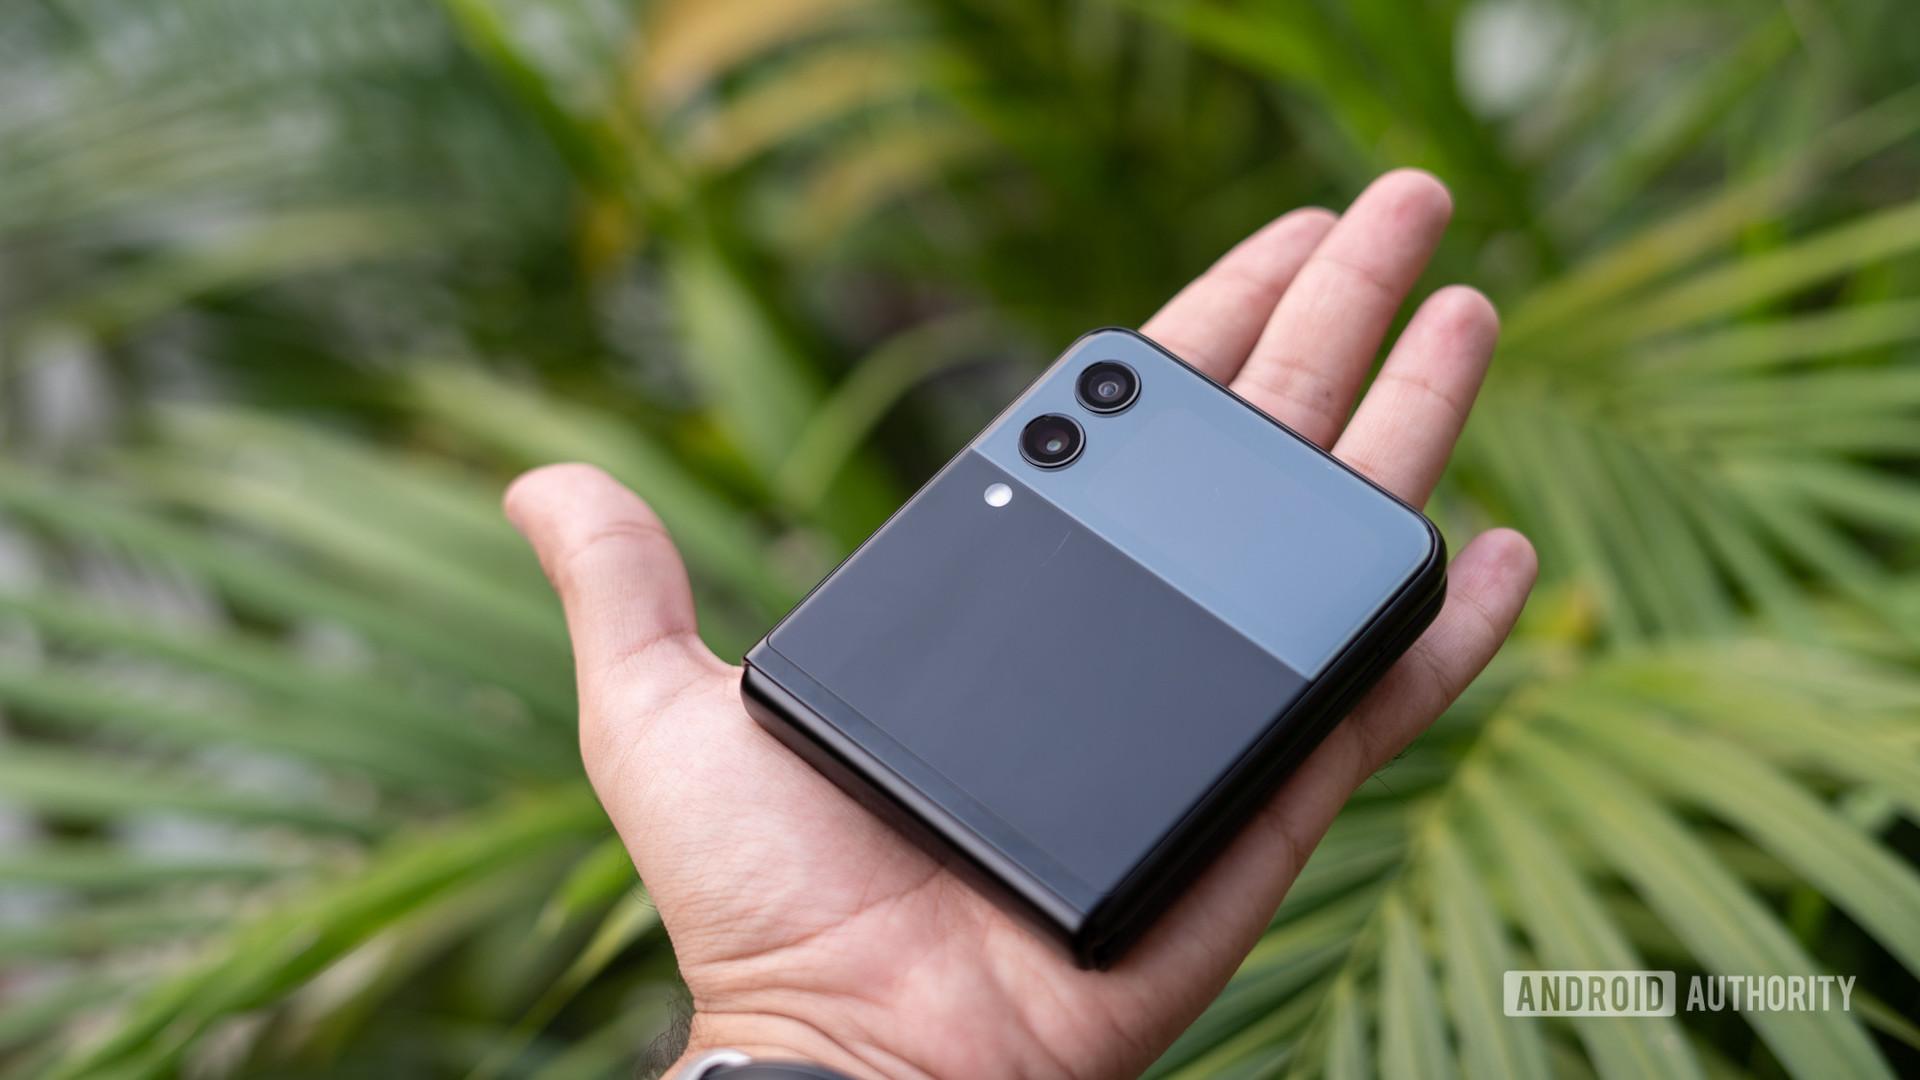 Samsung Galaxy Z Flip 3 in hand closed up